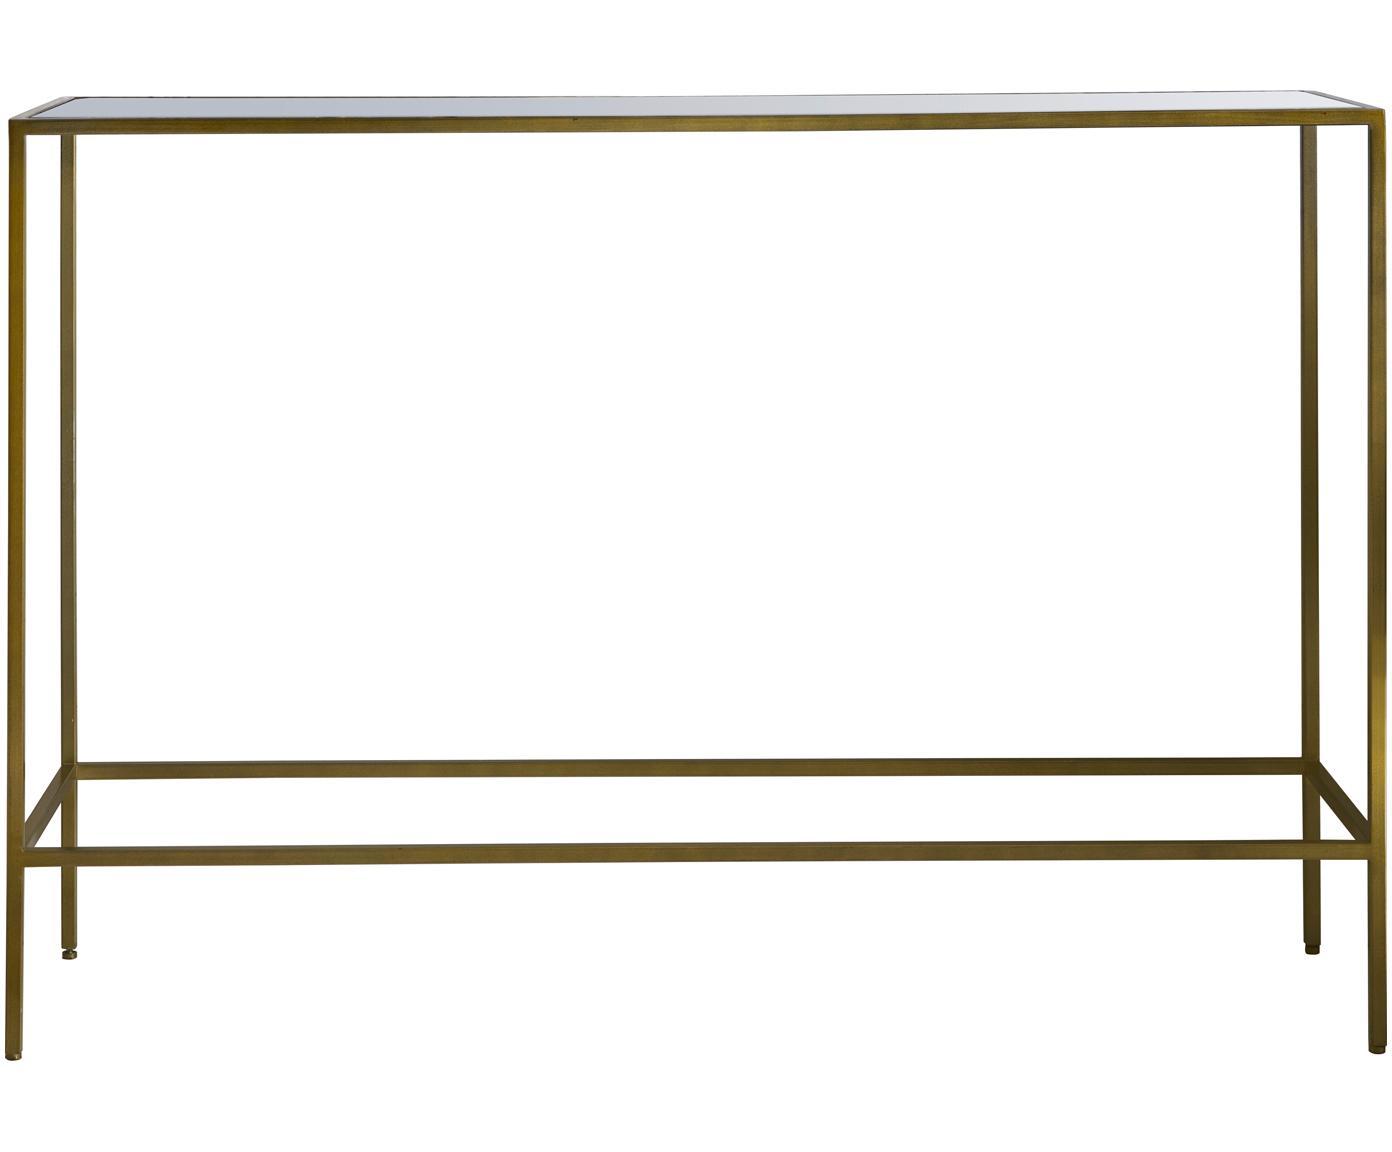 Sidetable Rothbury met glazen plateau, Frame: gelakt metaal, Tafelblad: glas, Bronskleurig, transparant, 110 x 76 cm